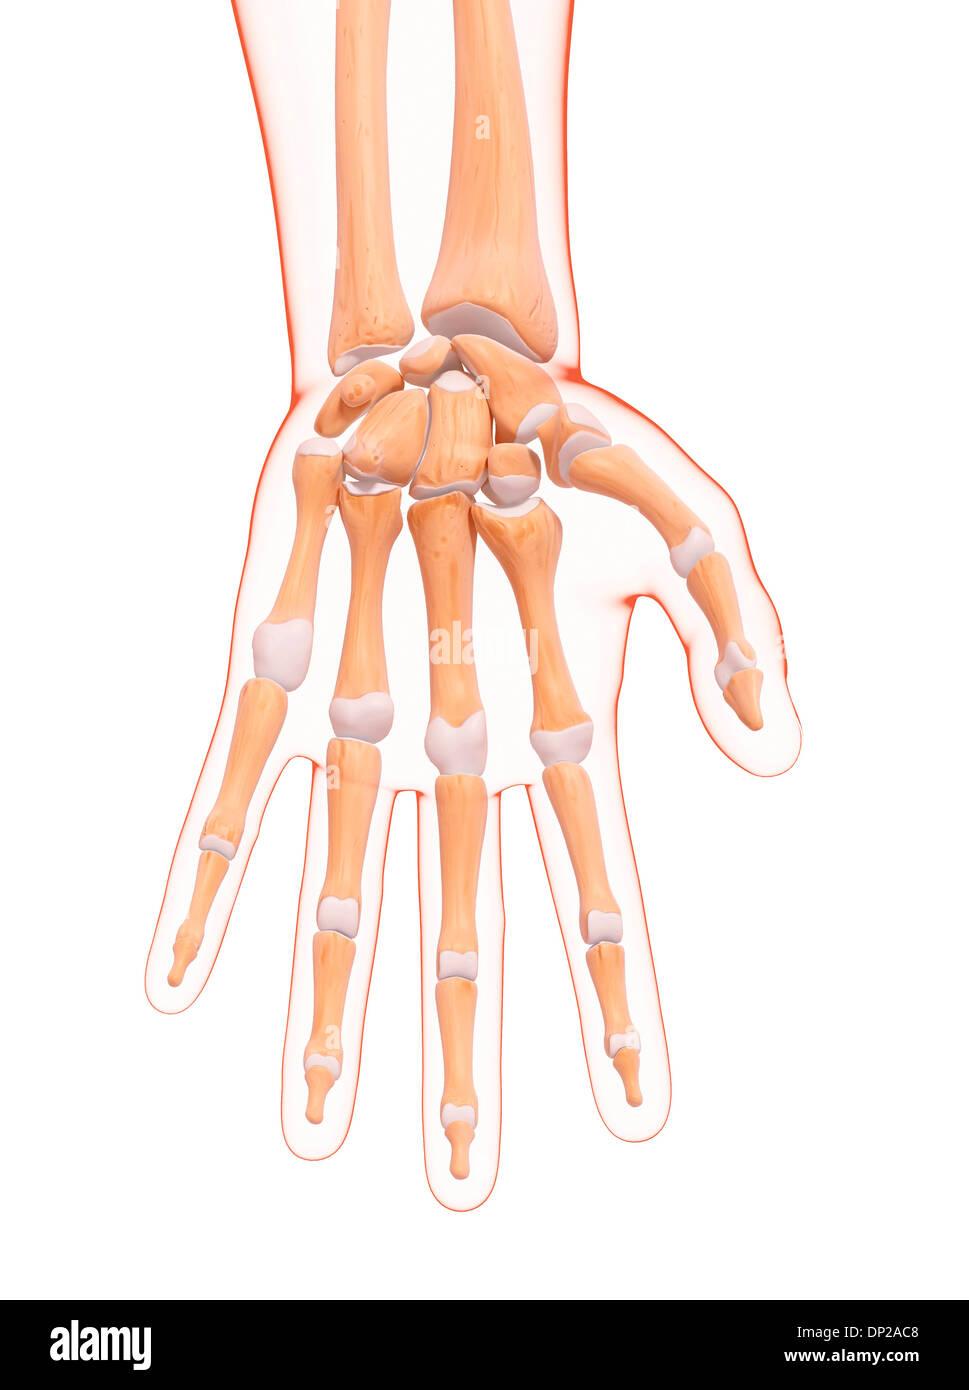 Human Hand Bones Artwork Stock Photo 65205624 Alamy